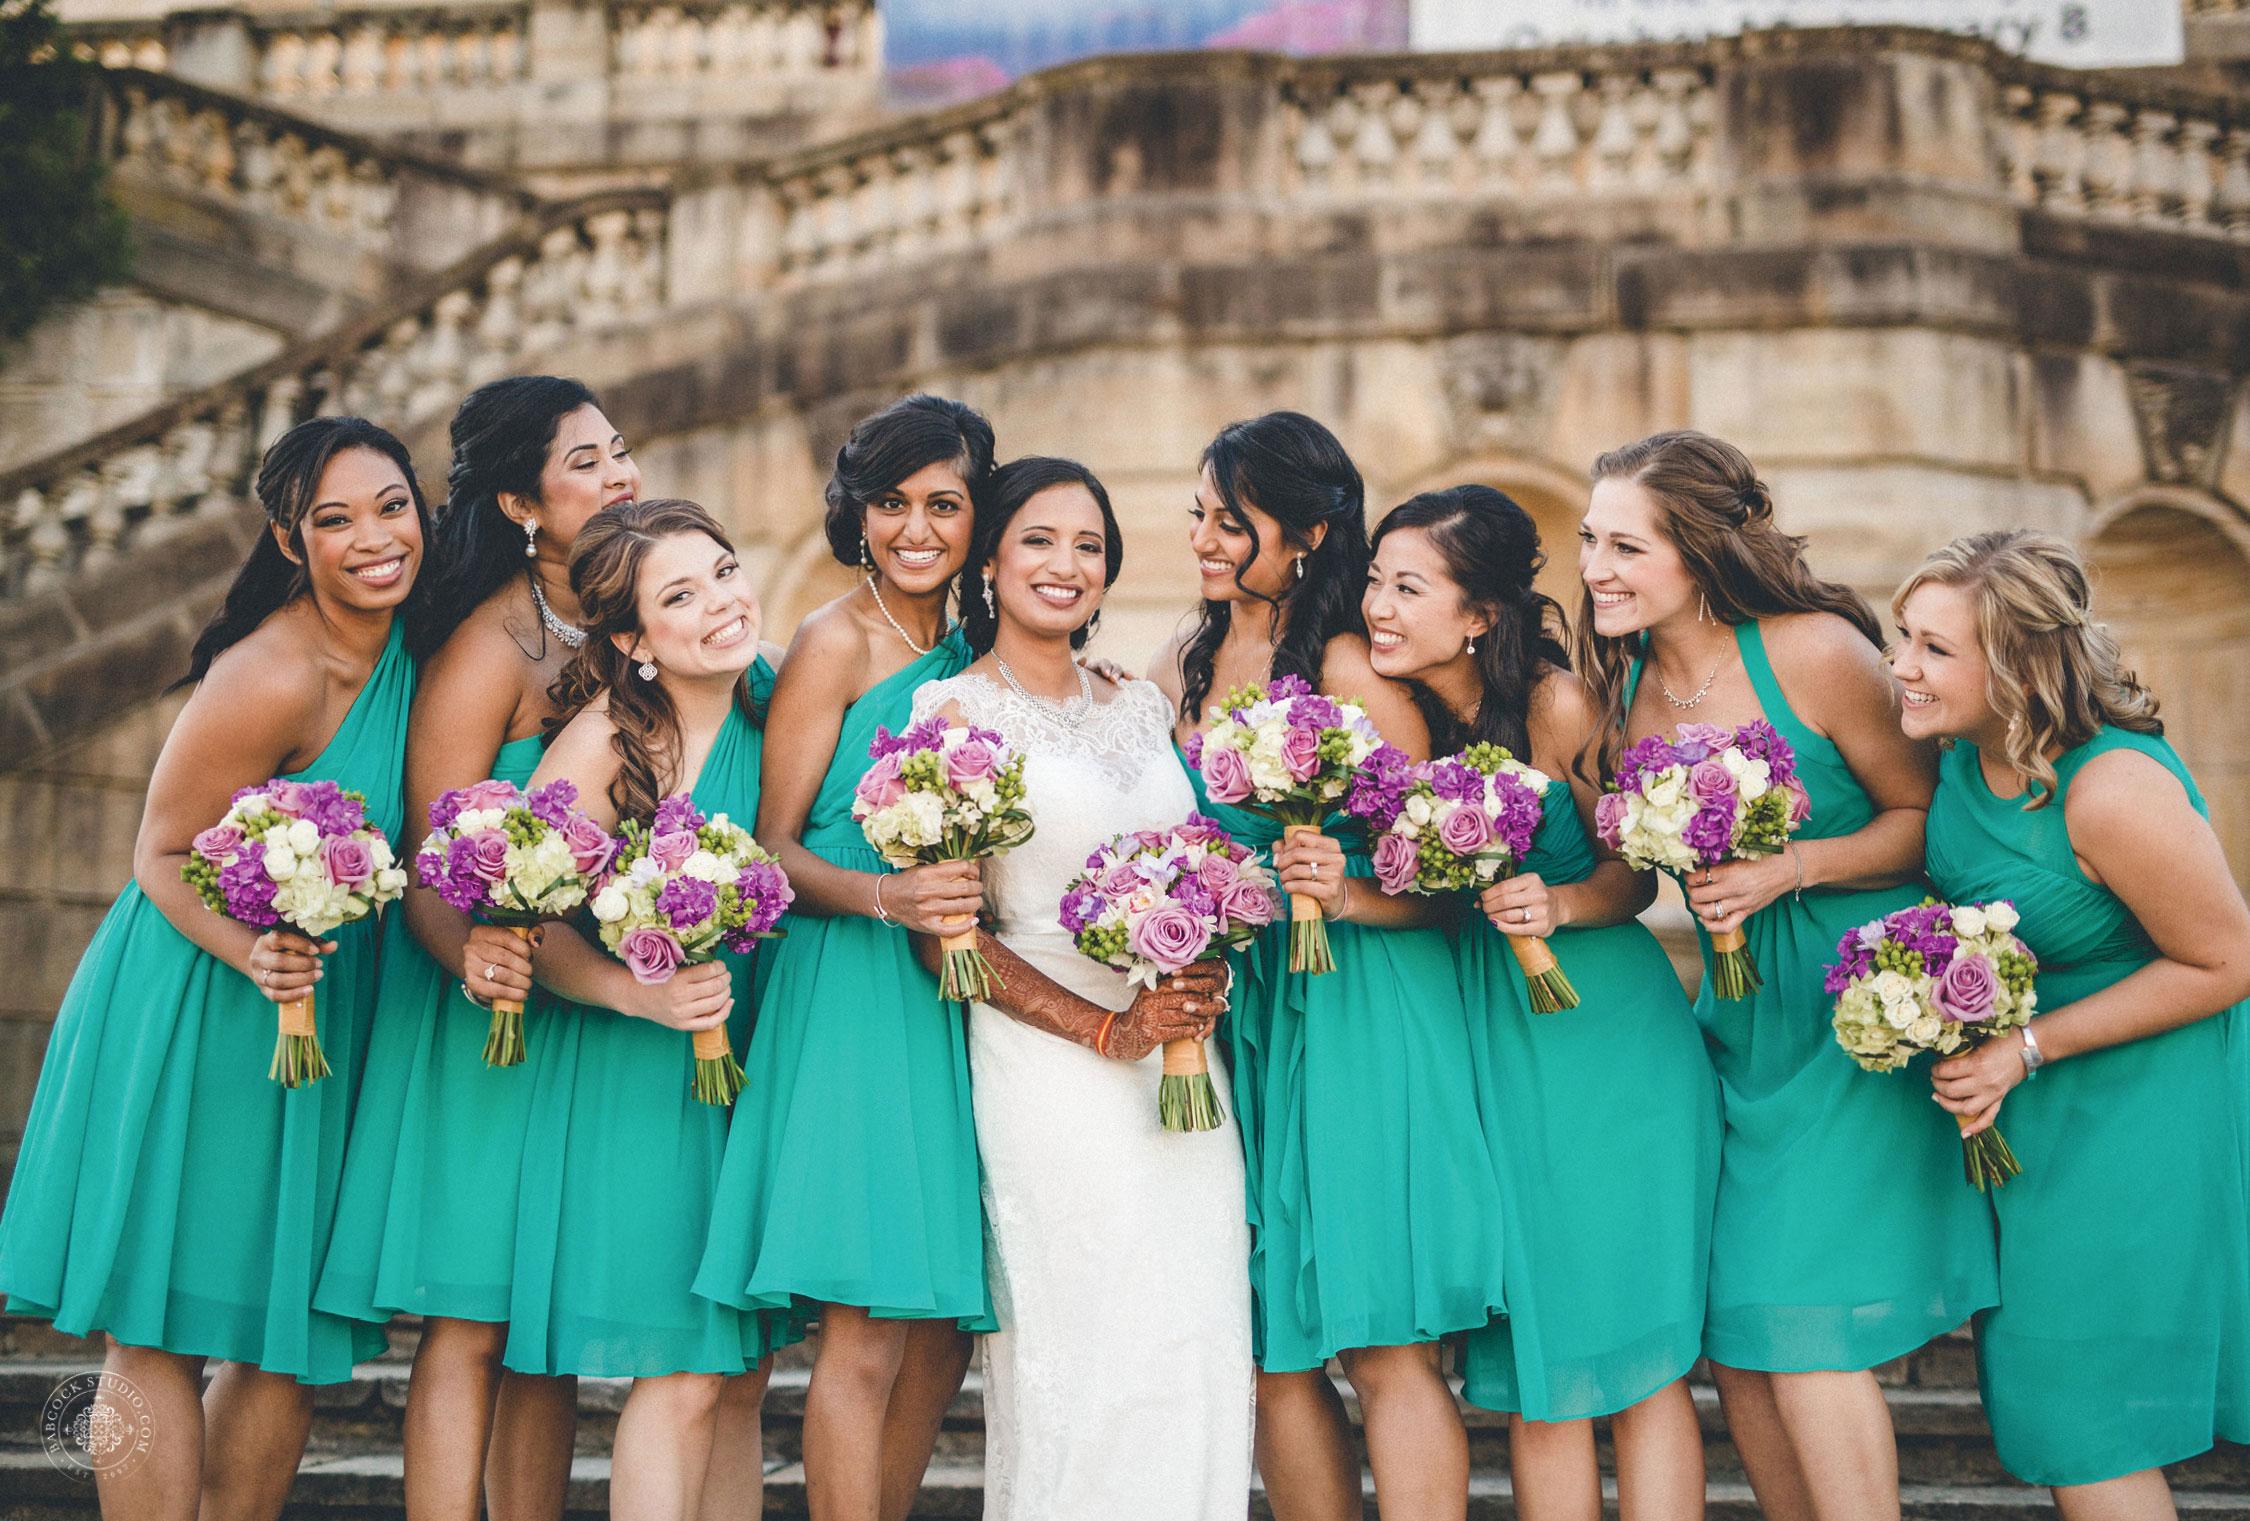 mayuri-brent-indian-wedding-photographer-dayton-ohio-27.jpg